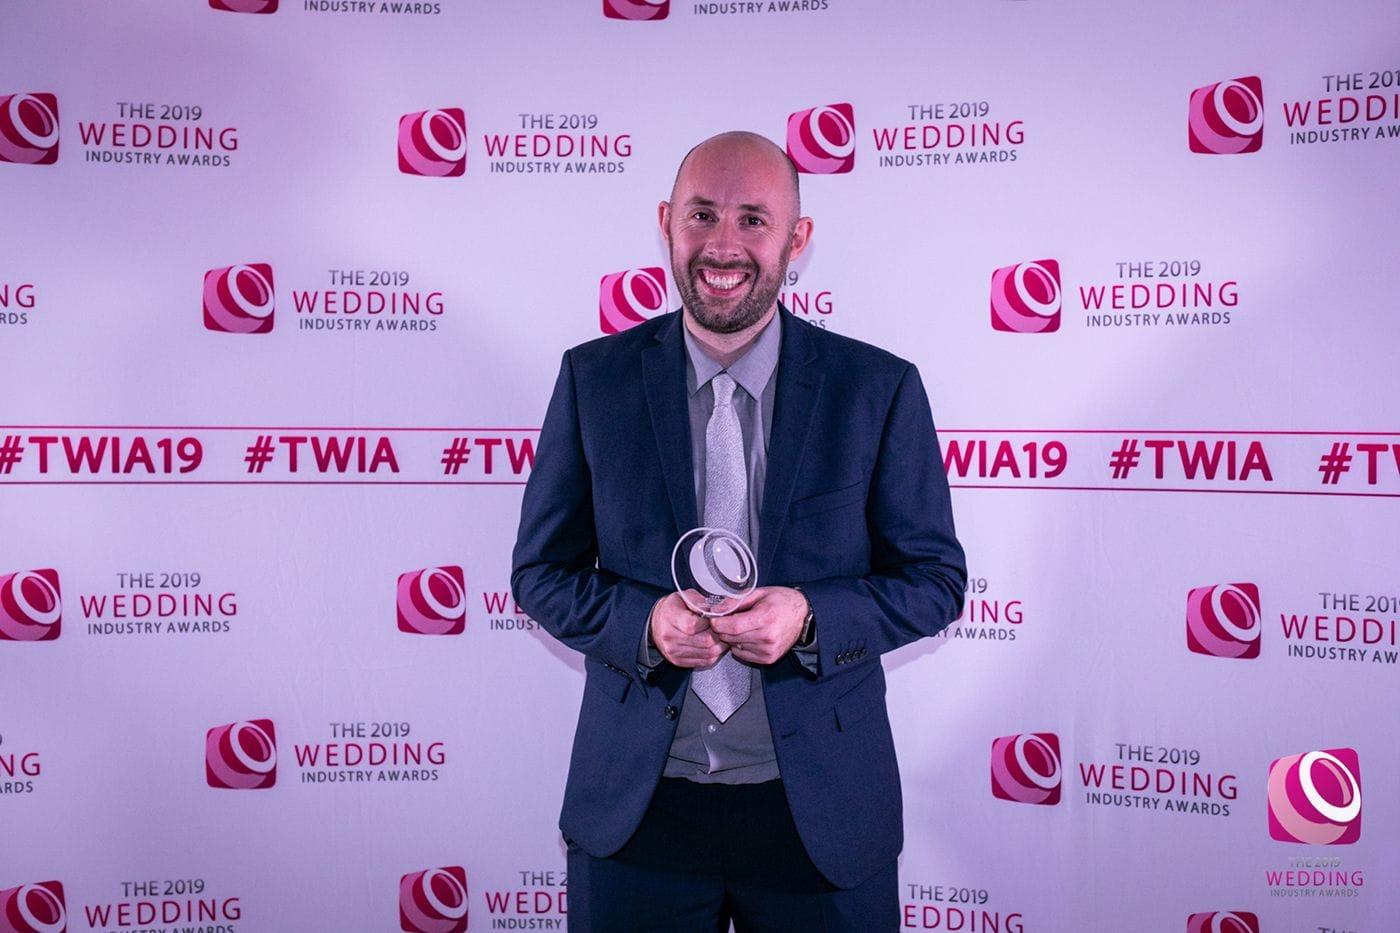 Best Essex Wedding Videographer Award